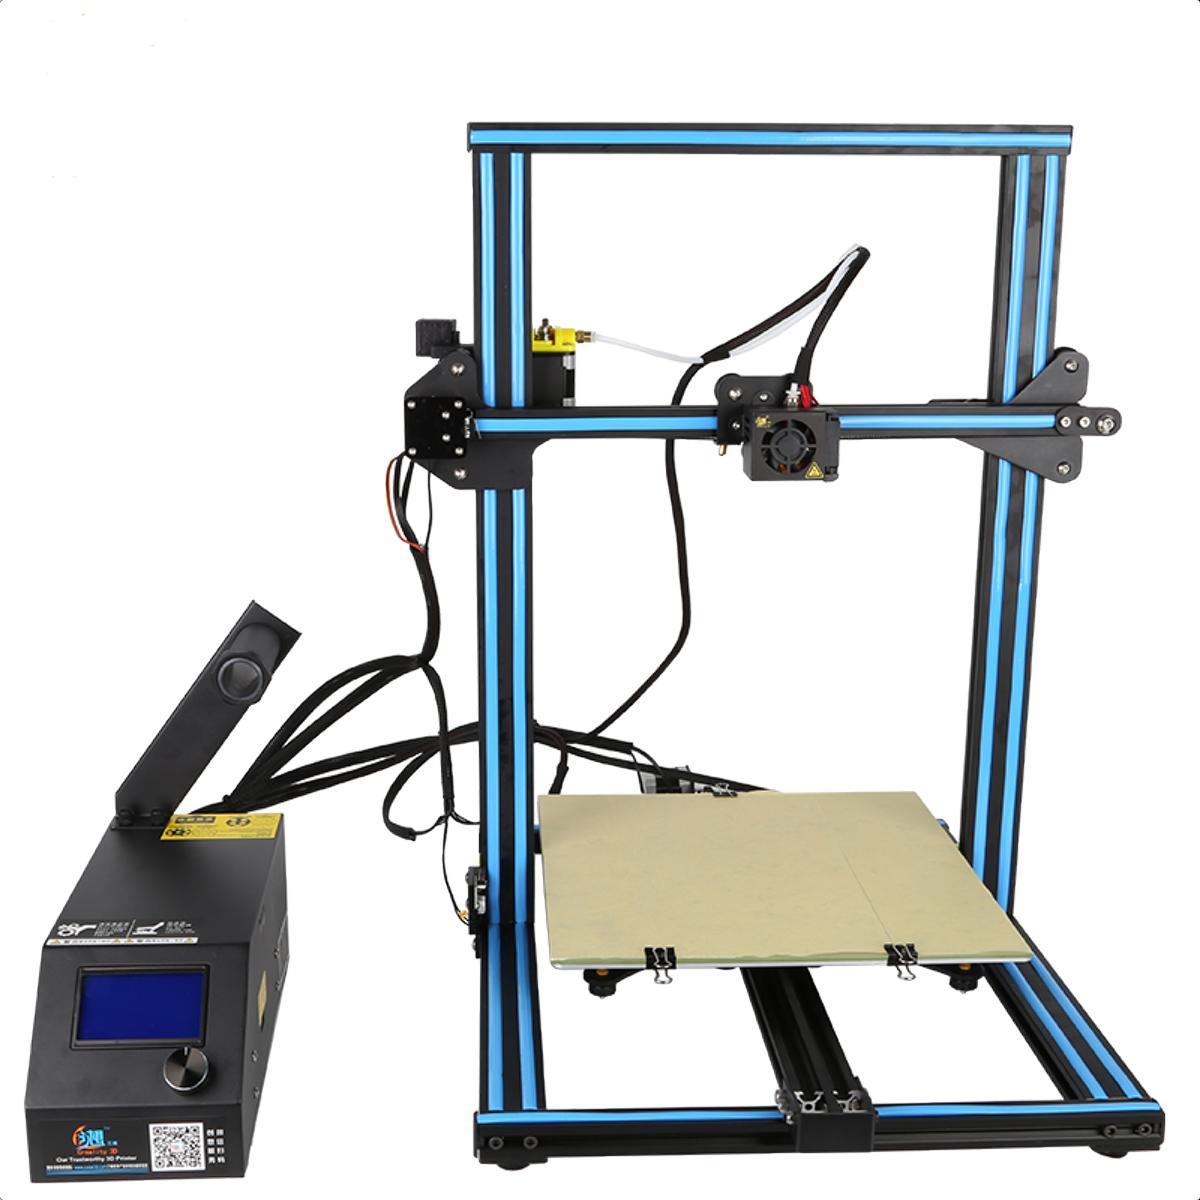 Creality3D CR - 10S 3D Desktop DIY Printer GROUP BUY ($539.99-197.70=$342.29)